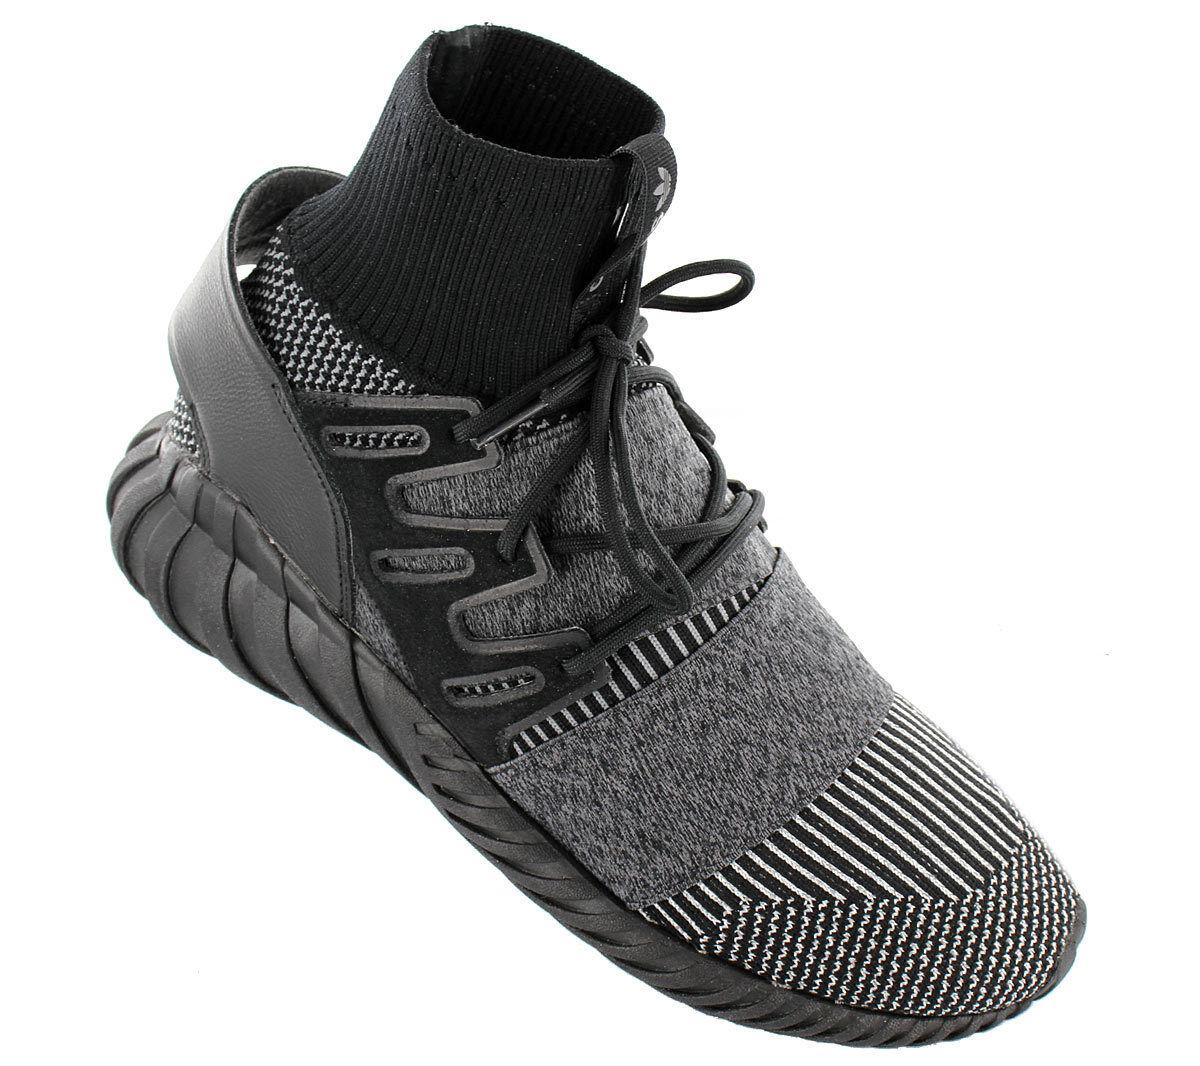 NEW adidas Originals Tubular Doom PK Primeknit BY3131 Men´s shoes Trainers Sneak